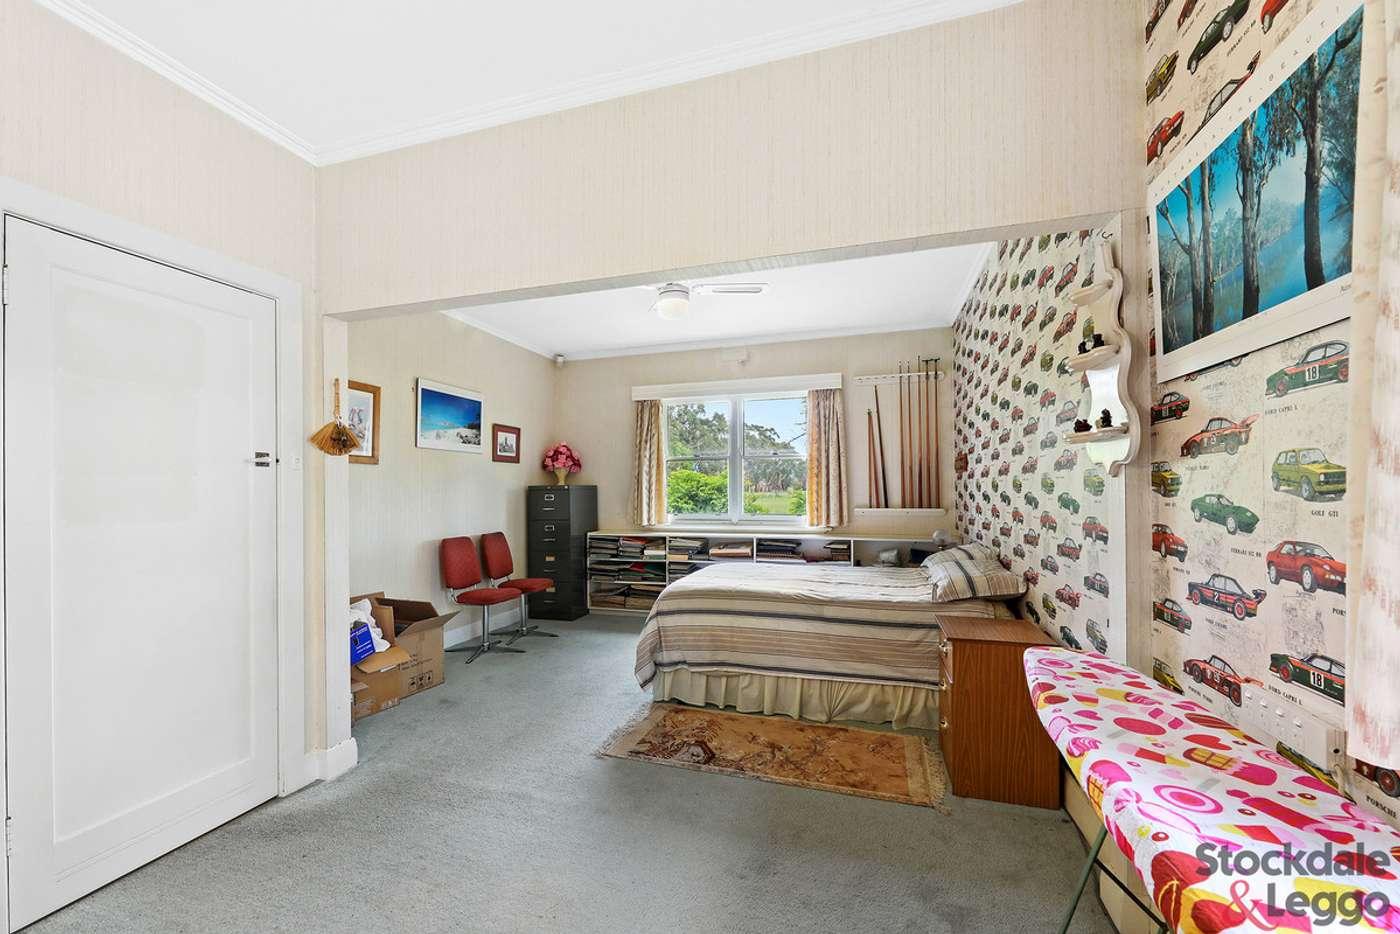 Fifth view of Homely house listing, 75 Becks Bridge Road, Newborough VIC 3825